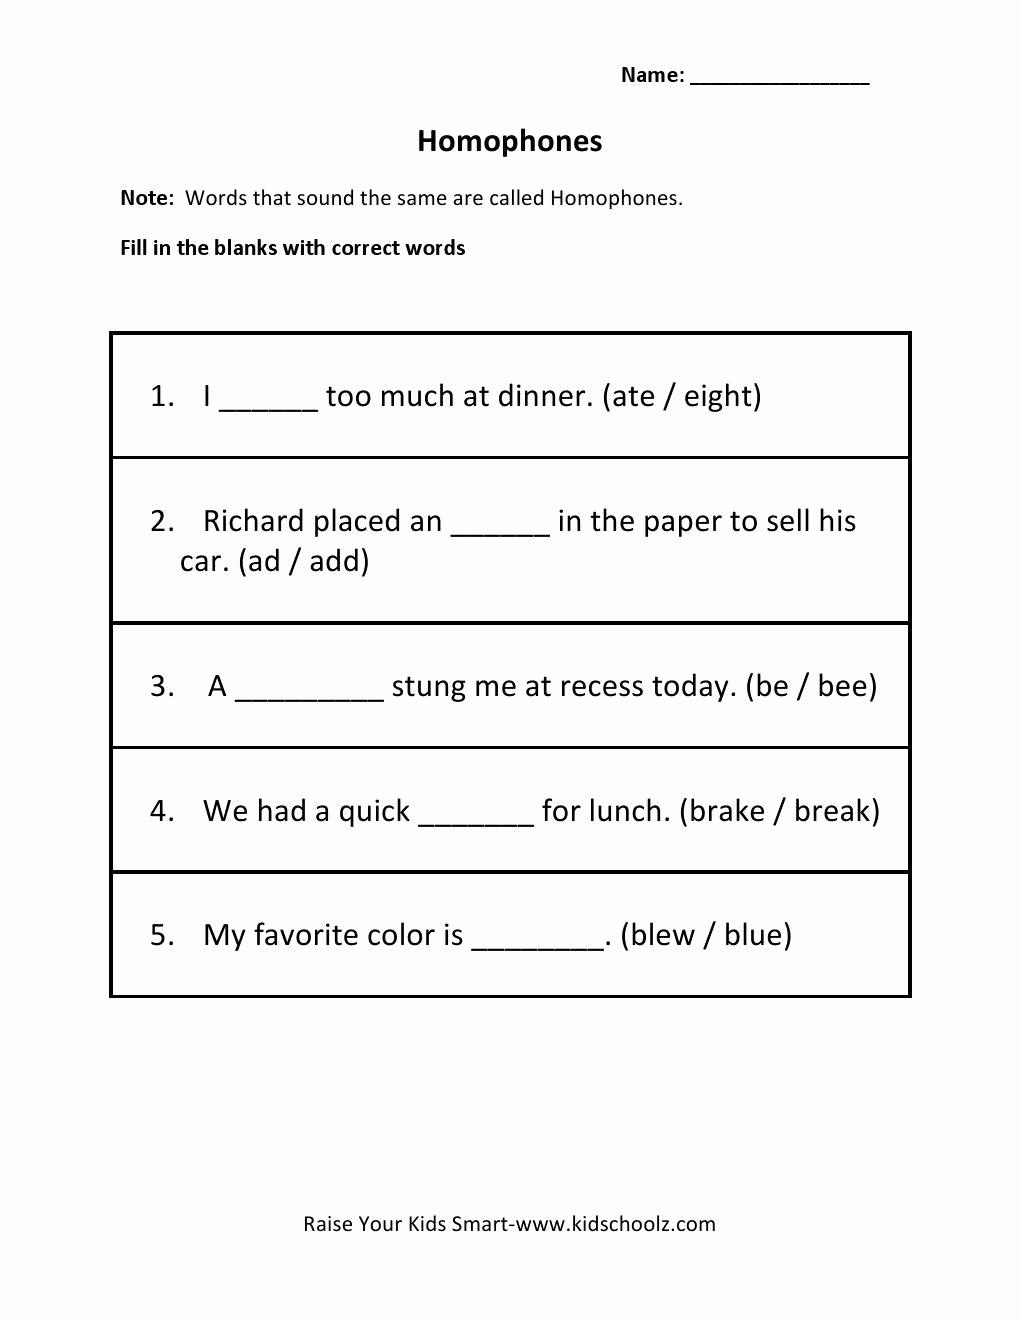 Homonyms Worksheets 5th Grade Inspirational 20 Homonyms Worksheets 5th Grade